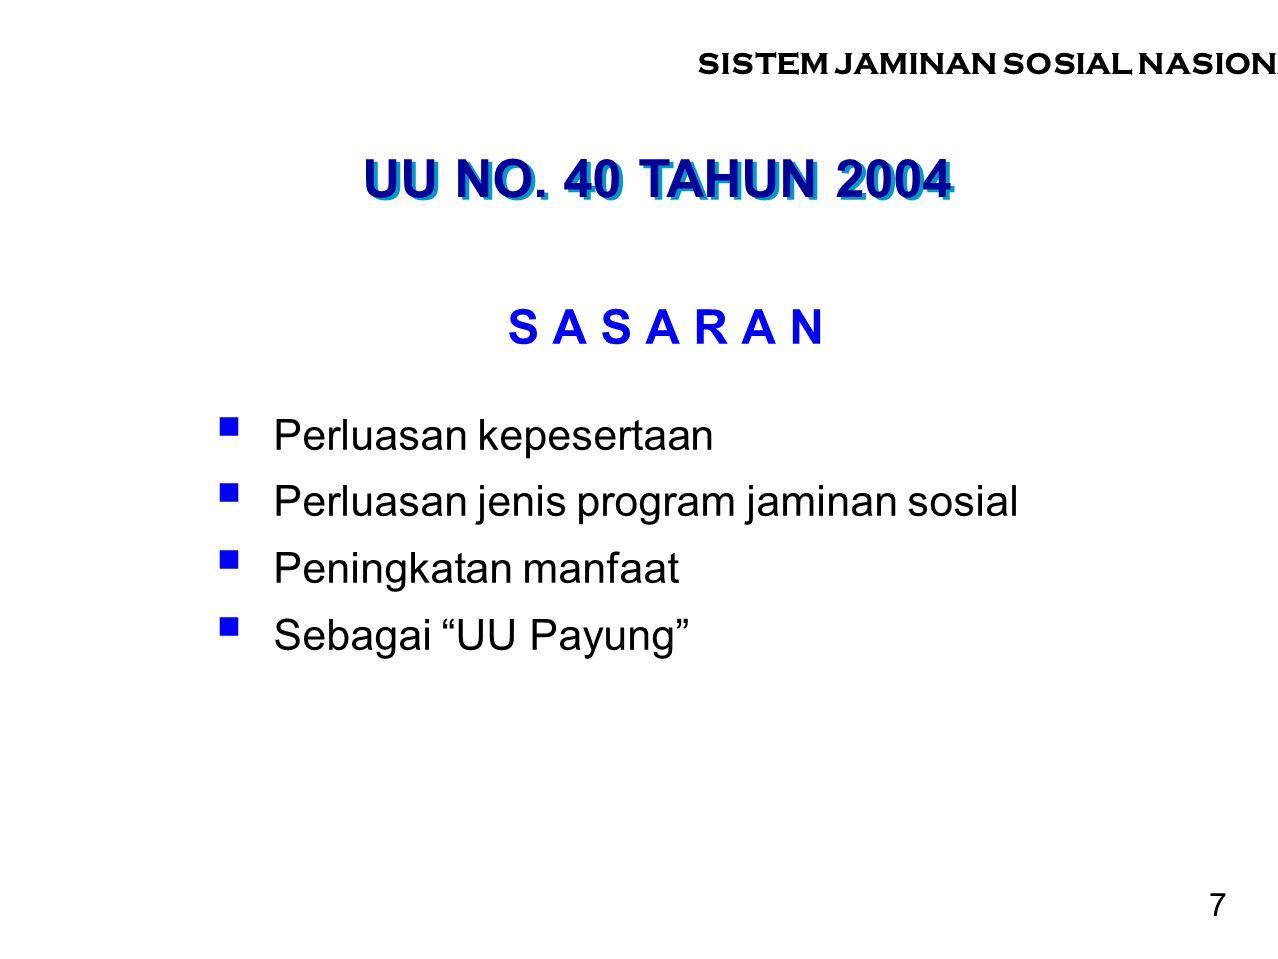 UU NO. 40 TAHUN 2004 S A S A R A N Perluasan kepesertaan